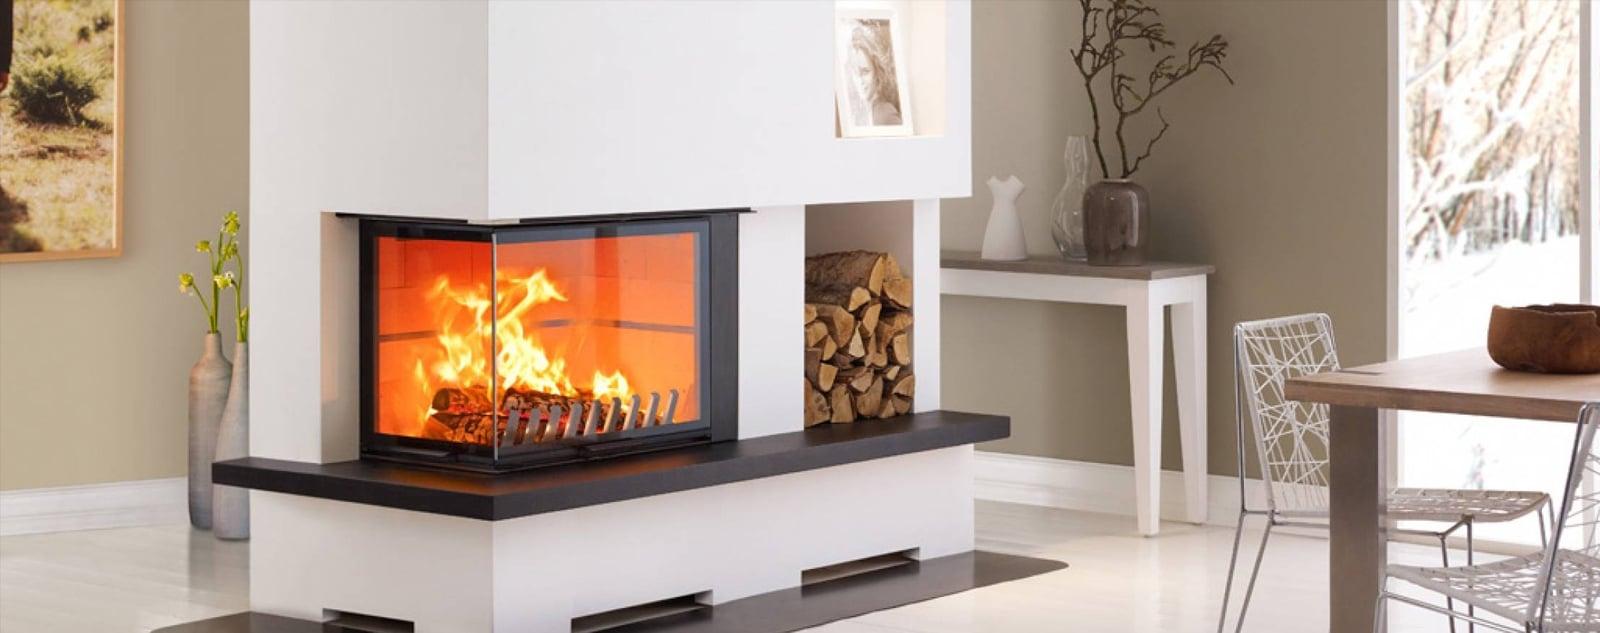 frquence ramonage chemine frquence ramonage chemine with. Black Bedroom Furniture Sets. Home Design Ideas